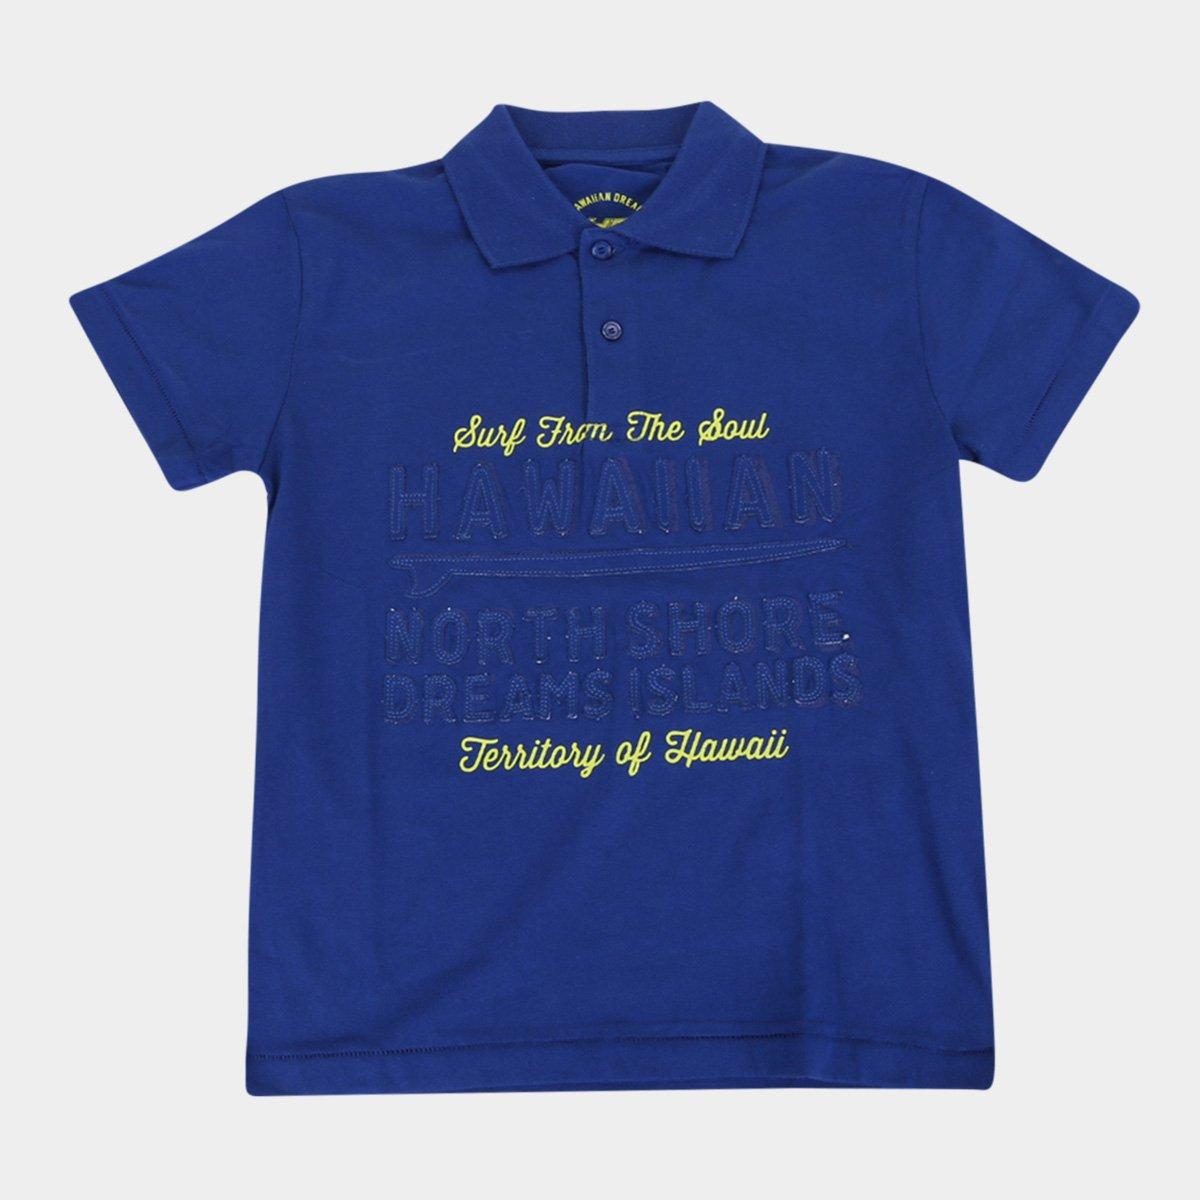 Camisa Polo Infantil HD Estampada Masculina